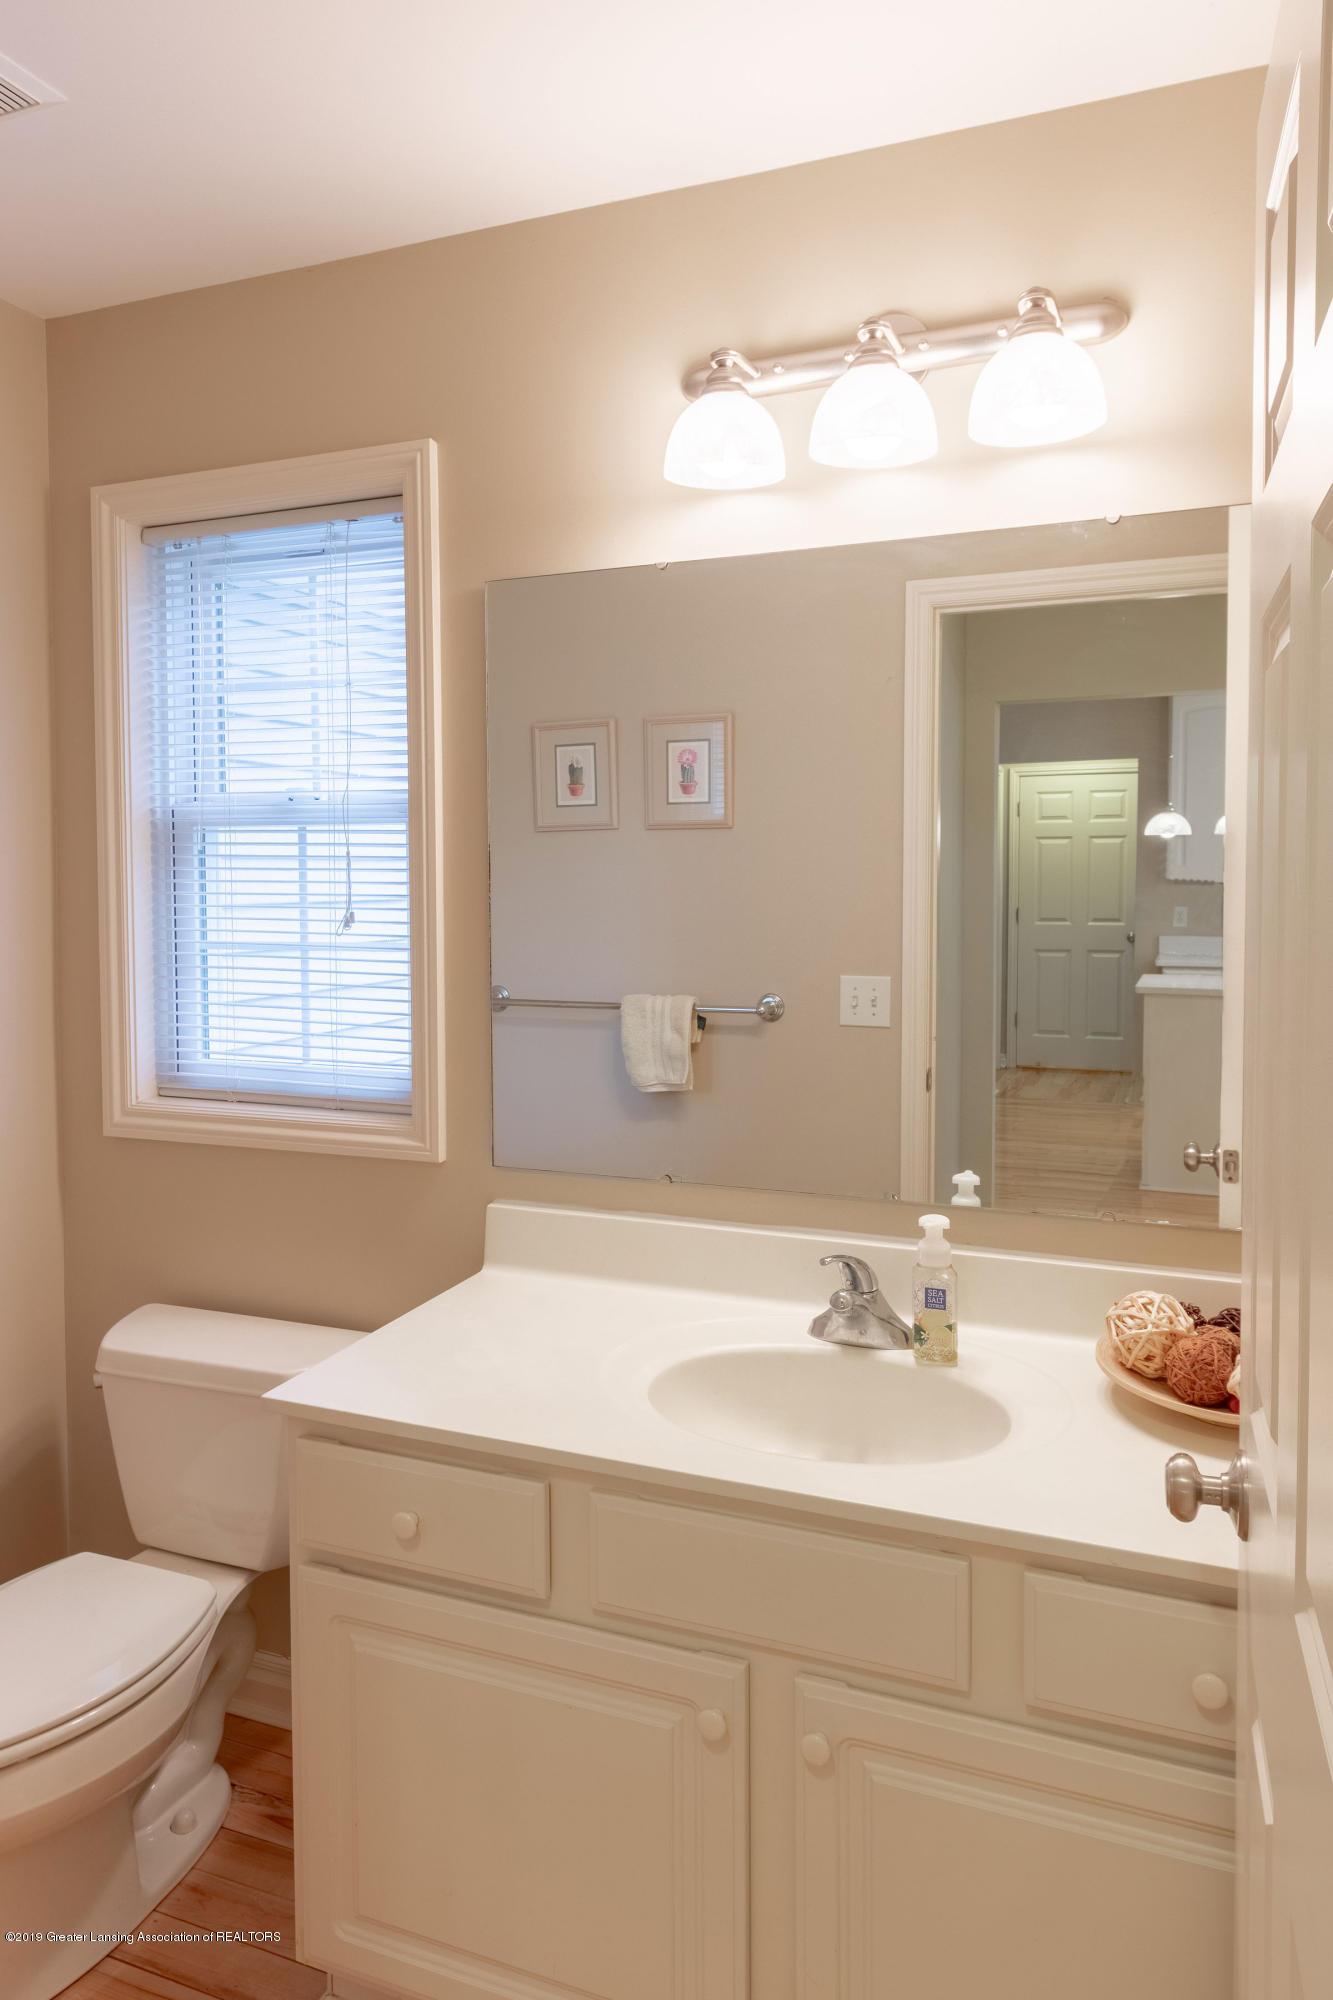 3585 W Arbutus Dr - Bathroom - 21